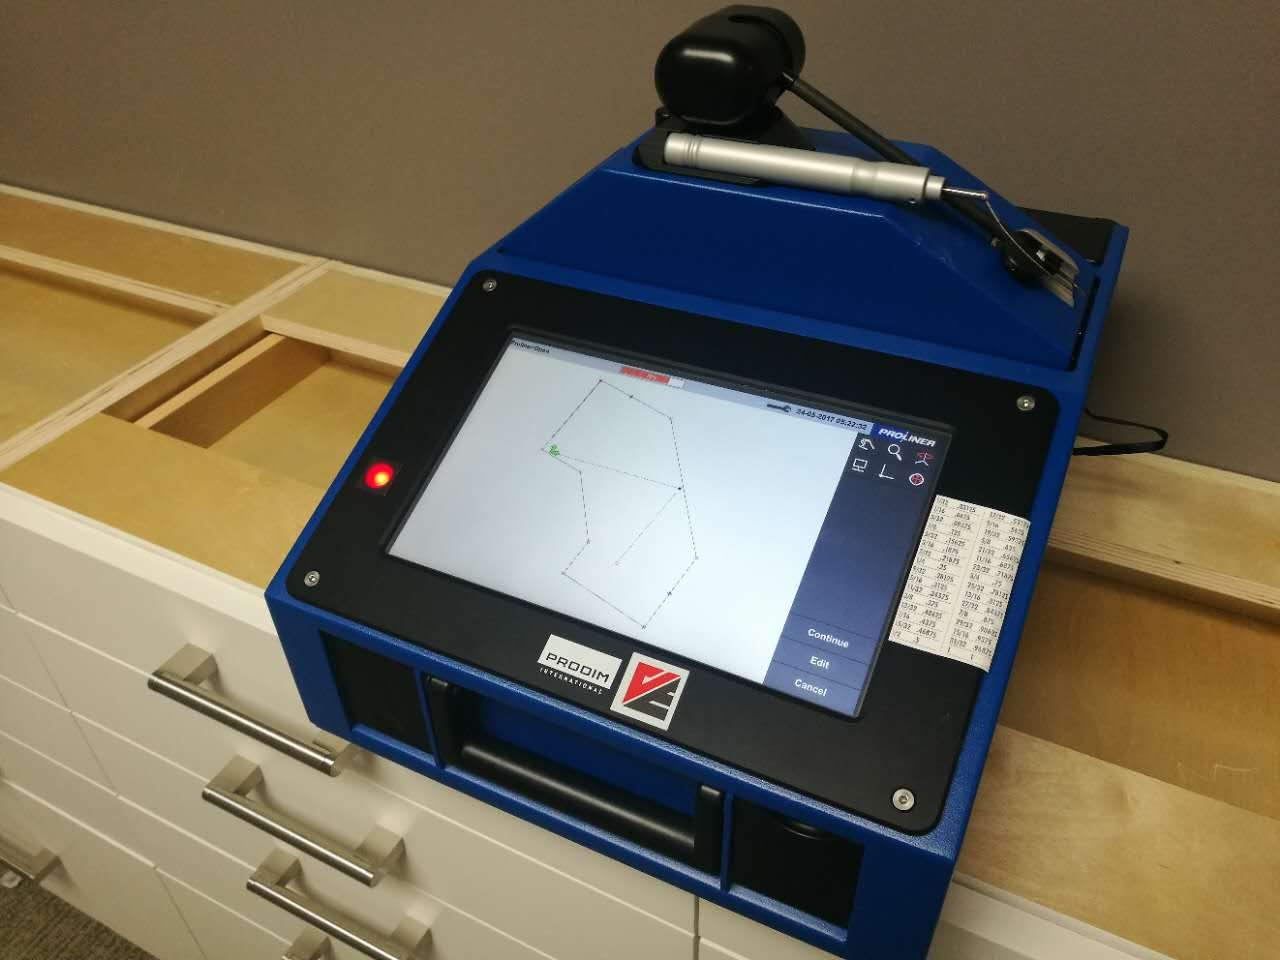 Proliner Measurement Device